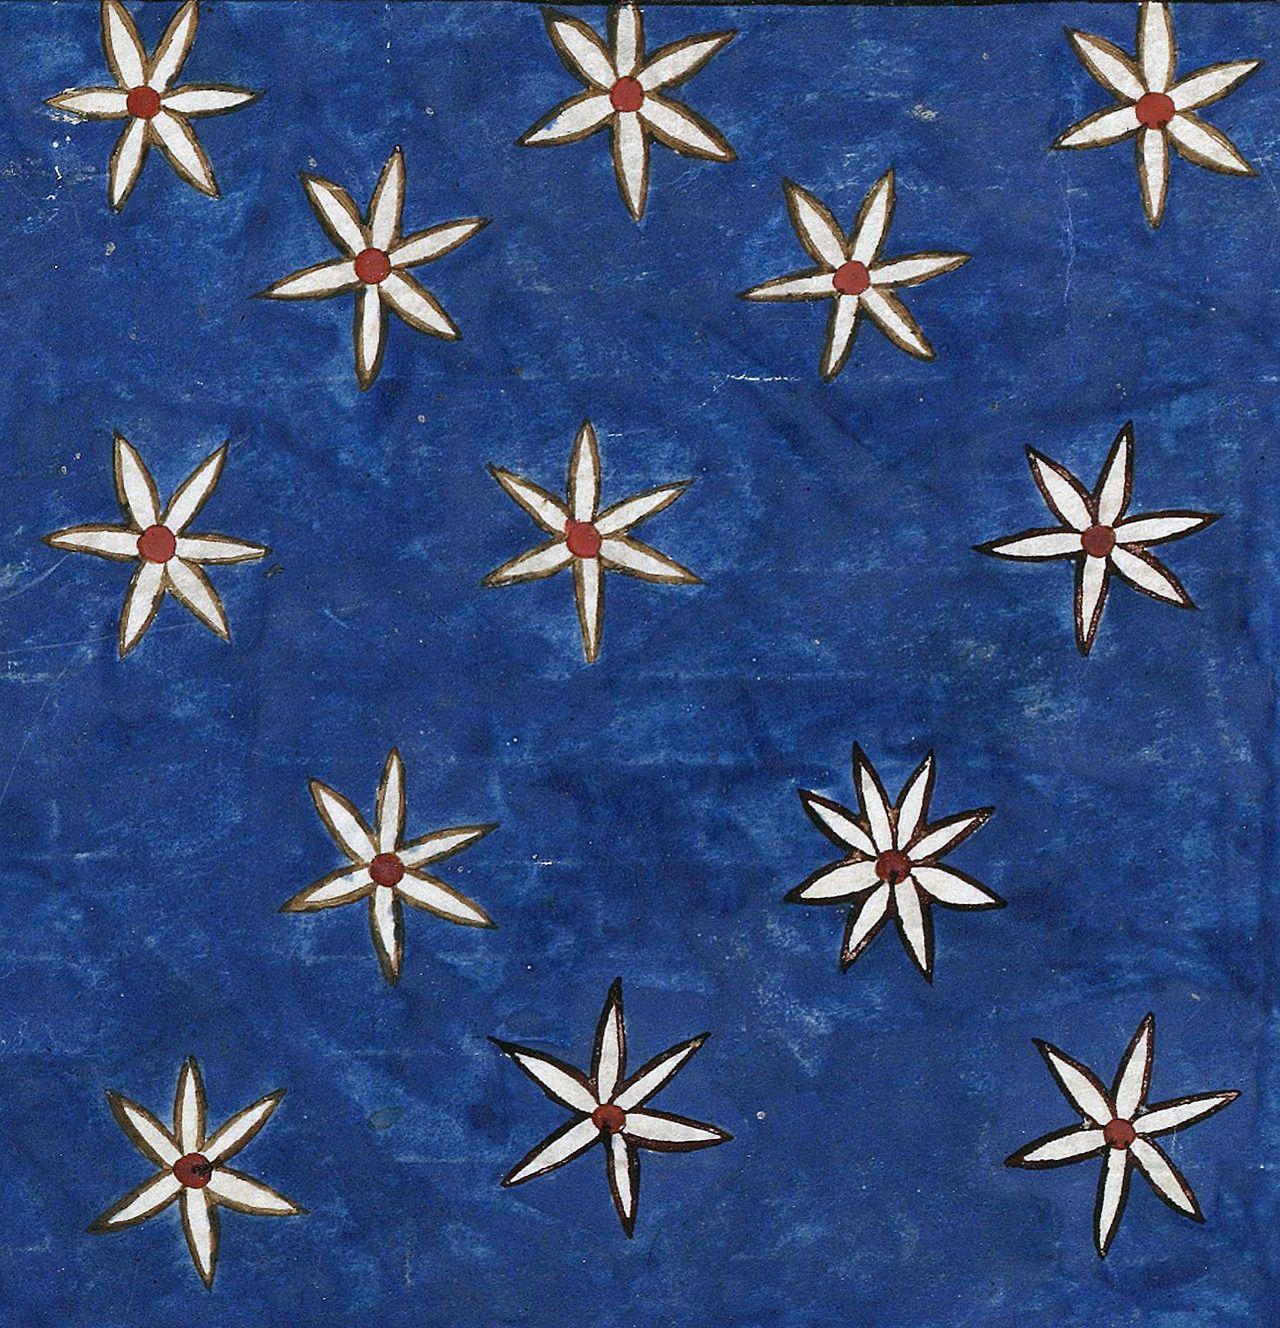 """ falling stars Beatus of Liébana, Commentaria in Apocalypsin (the 'Beatus of Saint-Sever'), Saint-Sever before 1072 BnF, Latin 8878, fol. 139v """